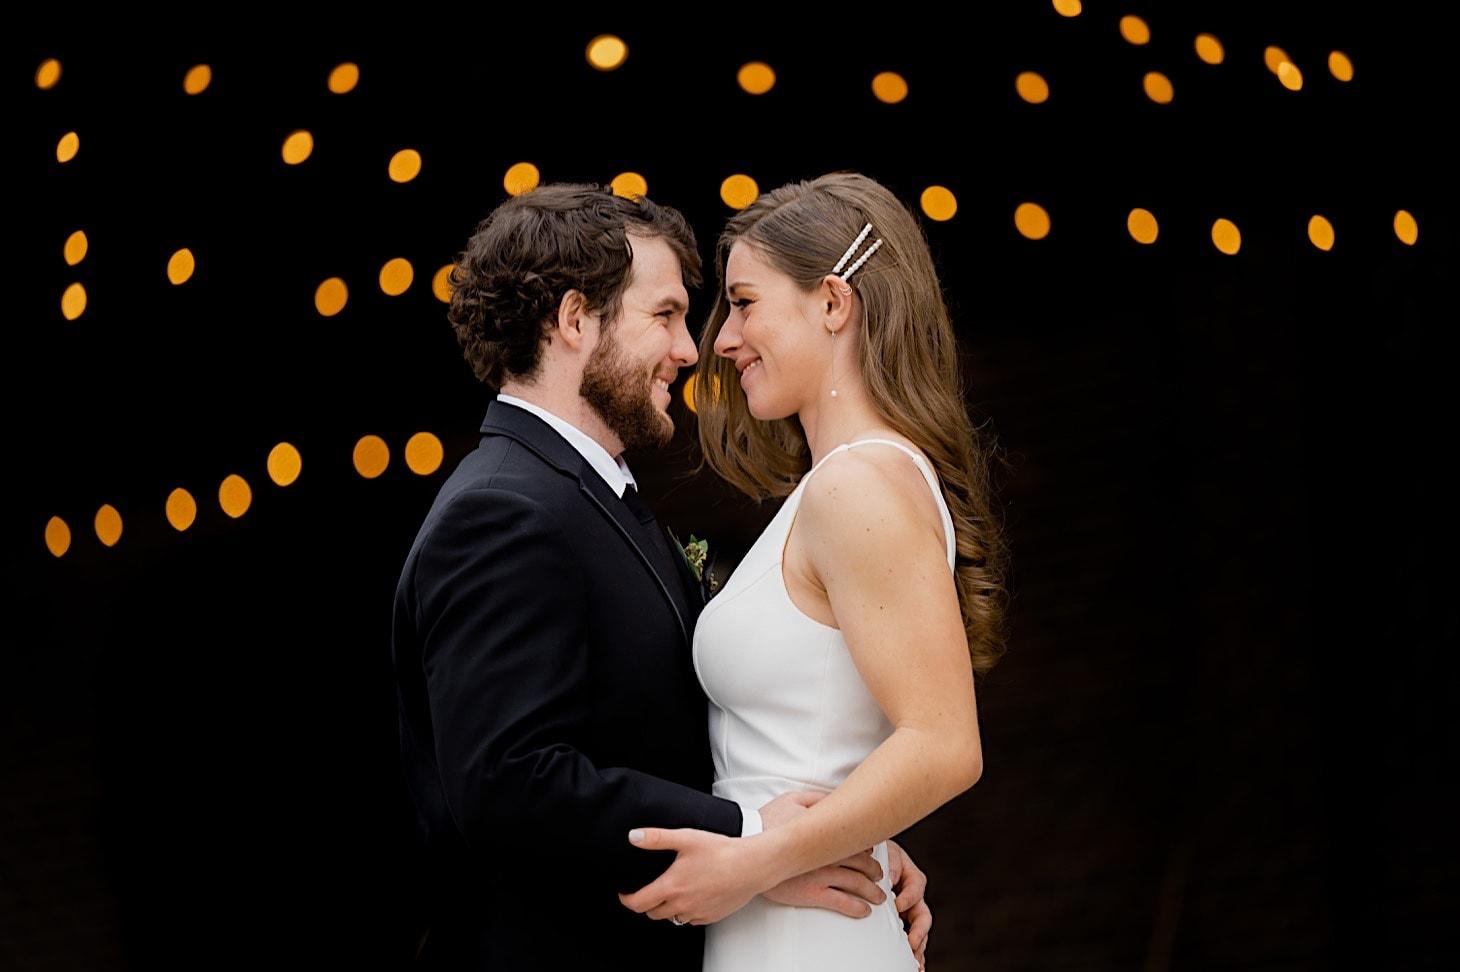 Des Moines Iowa couples photos